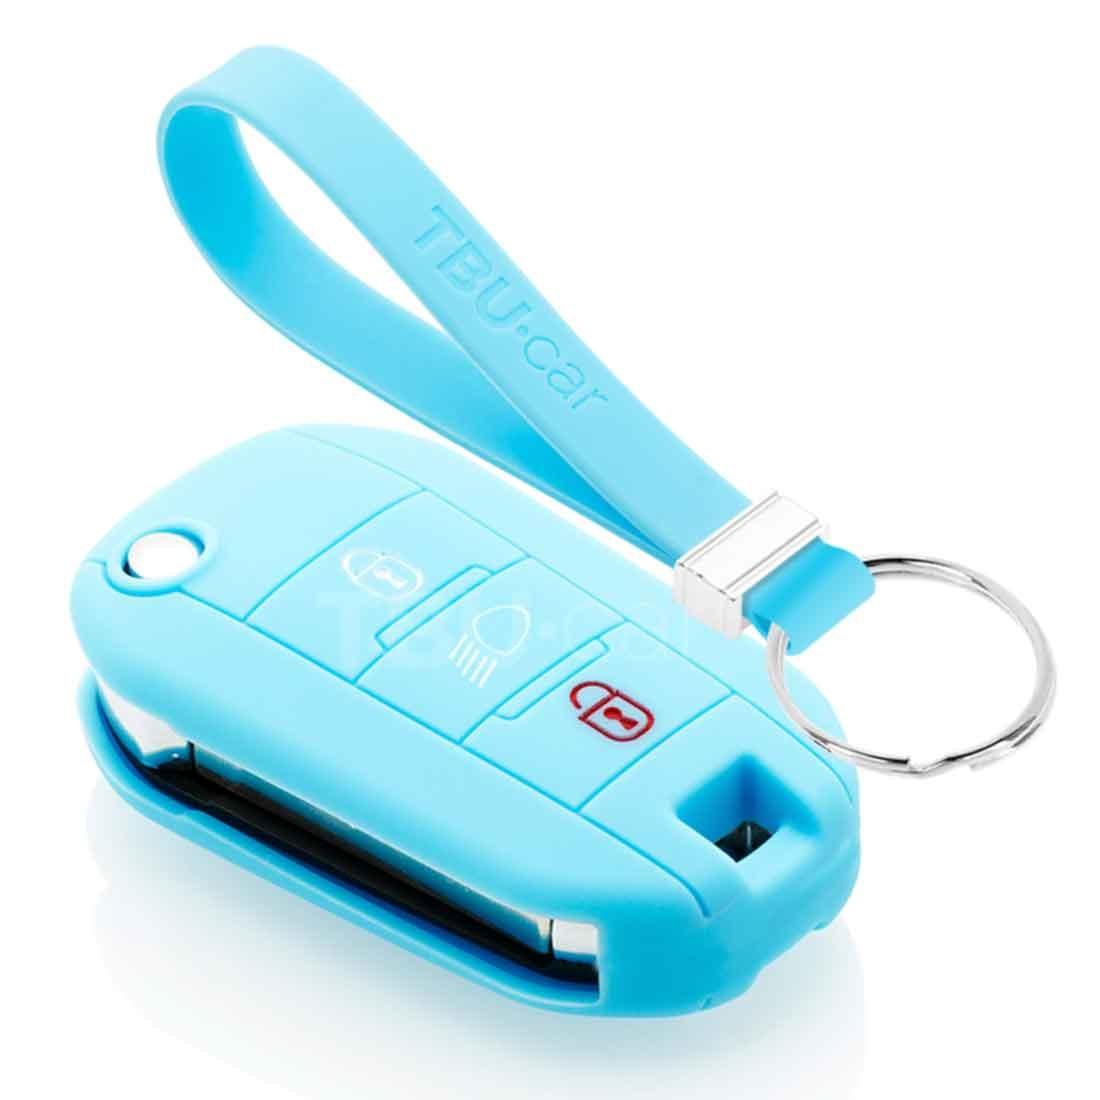 TBU car TBU car Autoschlüssel Hülle kompatibel mit Citroën 3 Tasten (Licht Taste) - Schutzhülle aus Silikon - Auto Schlüsselhülle Cover in Hellblau